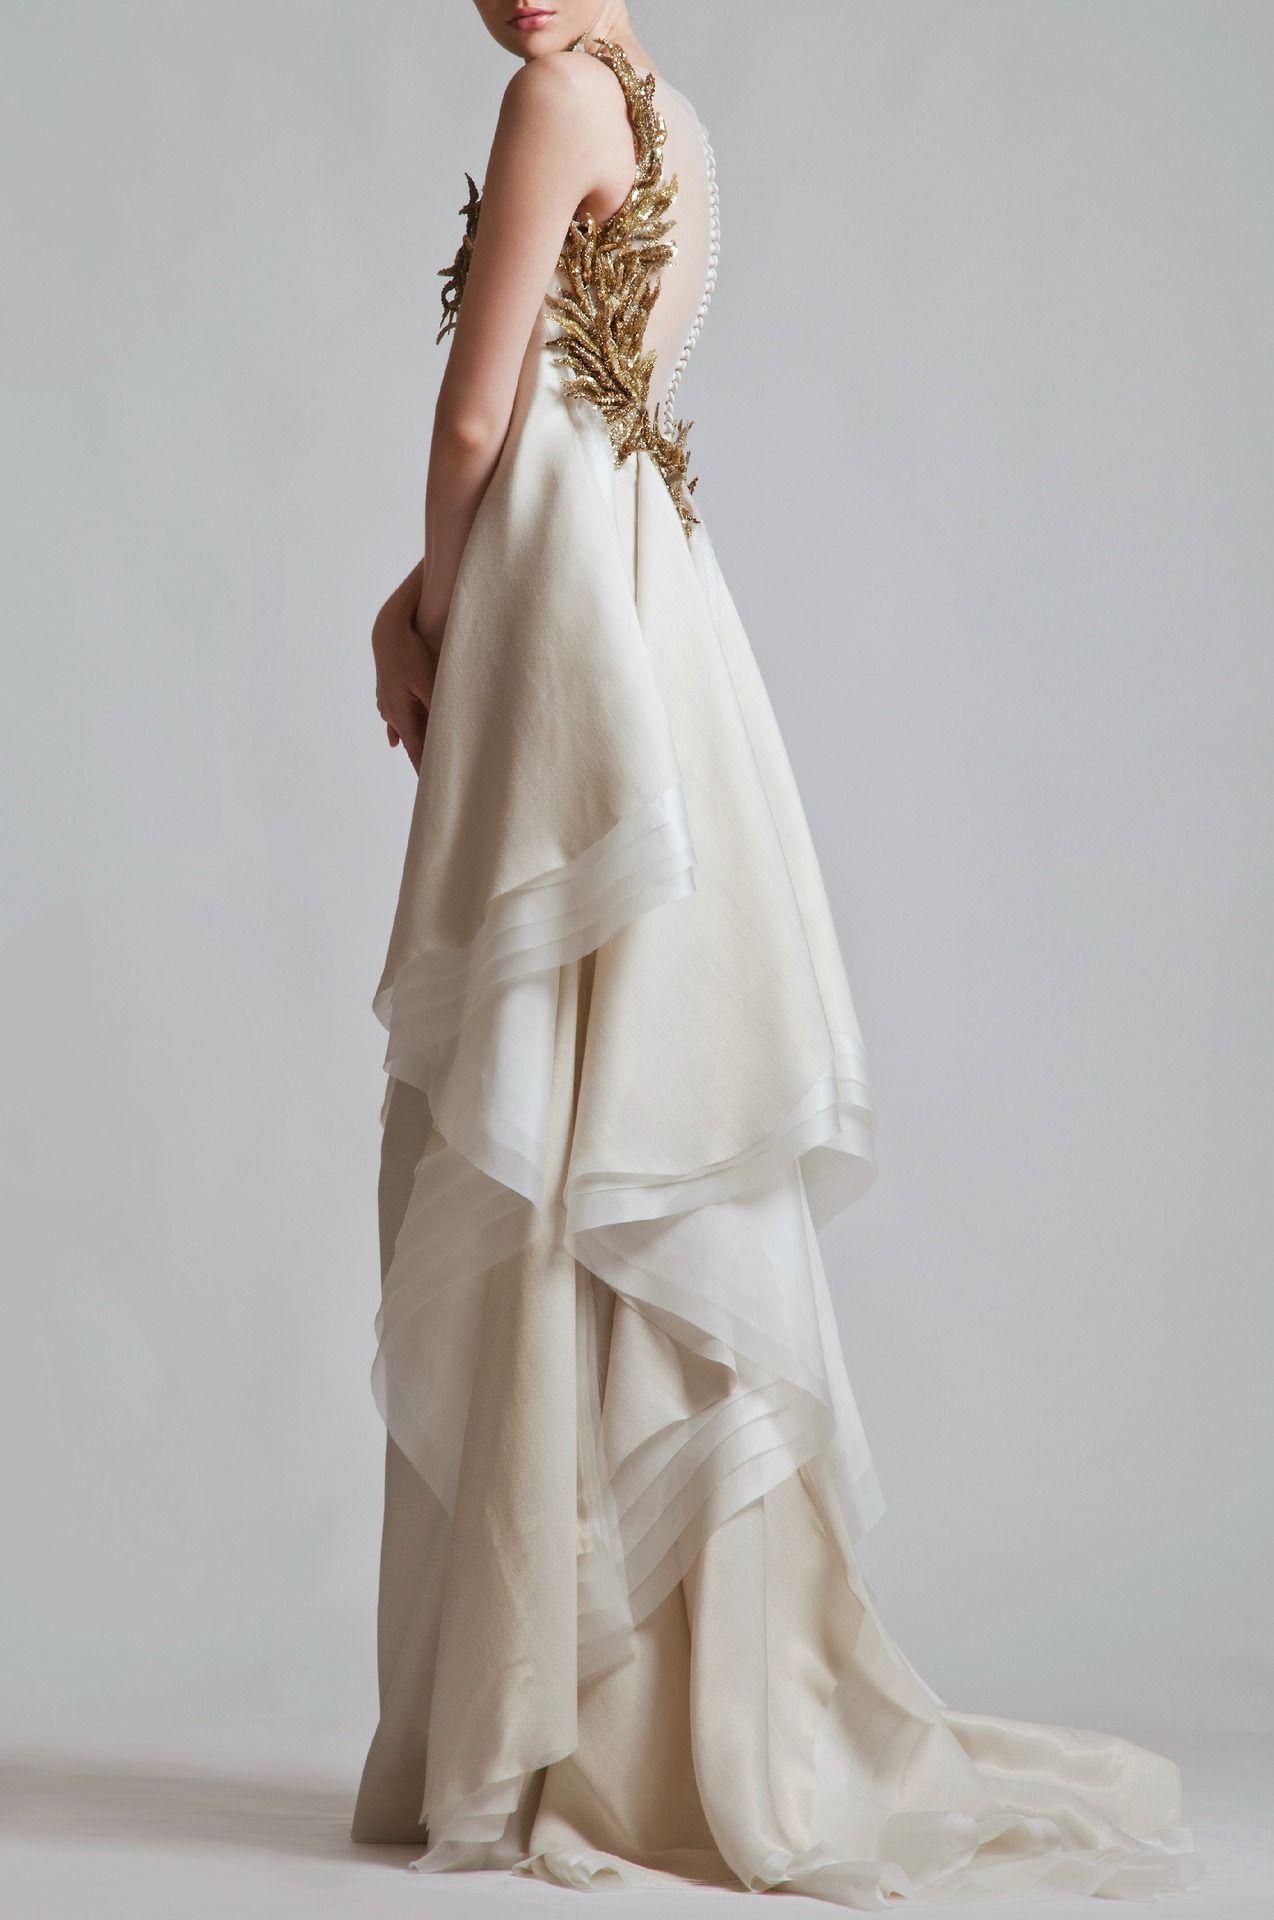 White gold wedding dress  hautekills Krikor Jabotian haute couture ss   clothes  gown